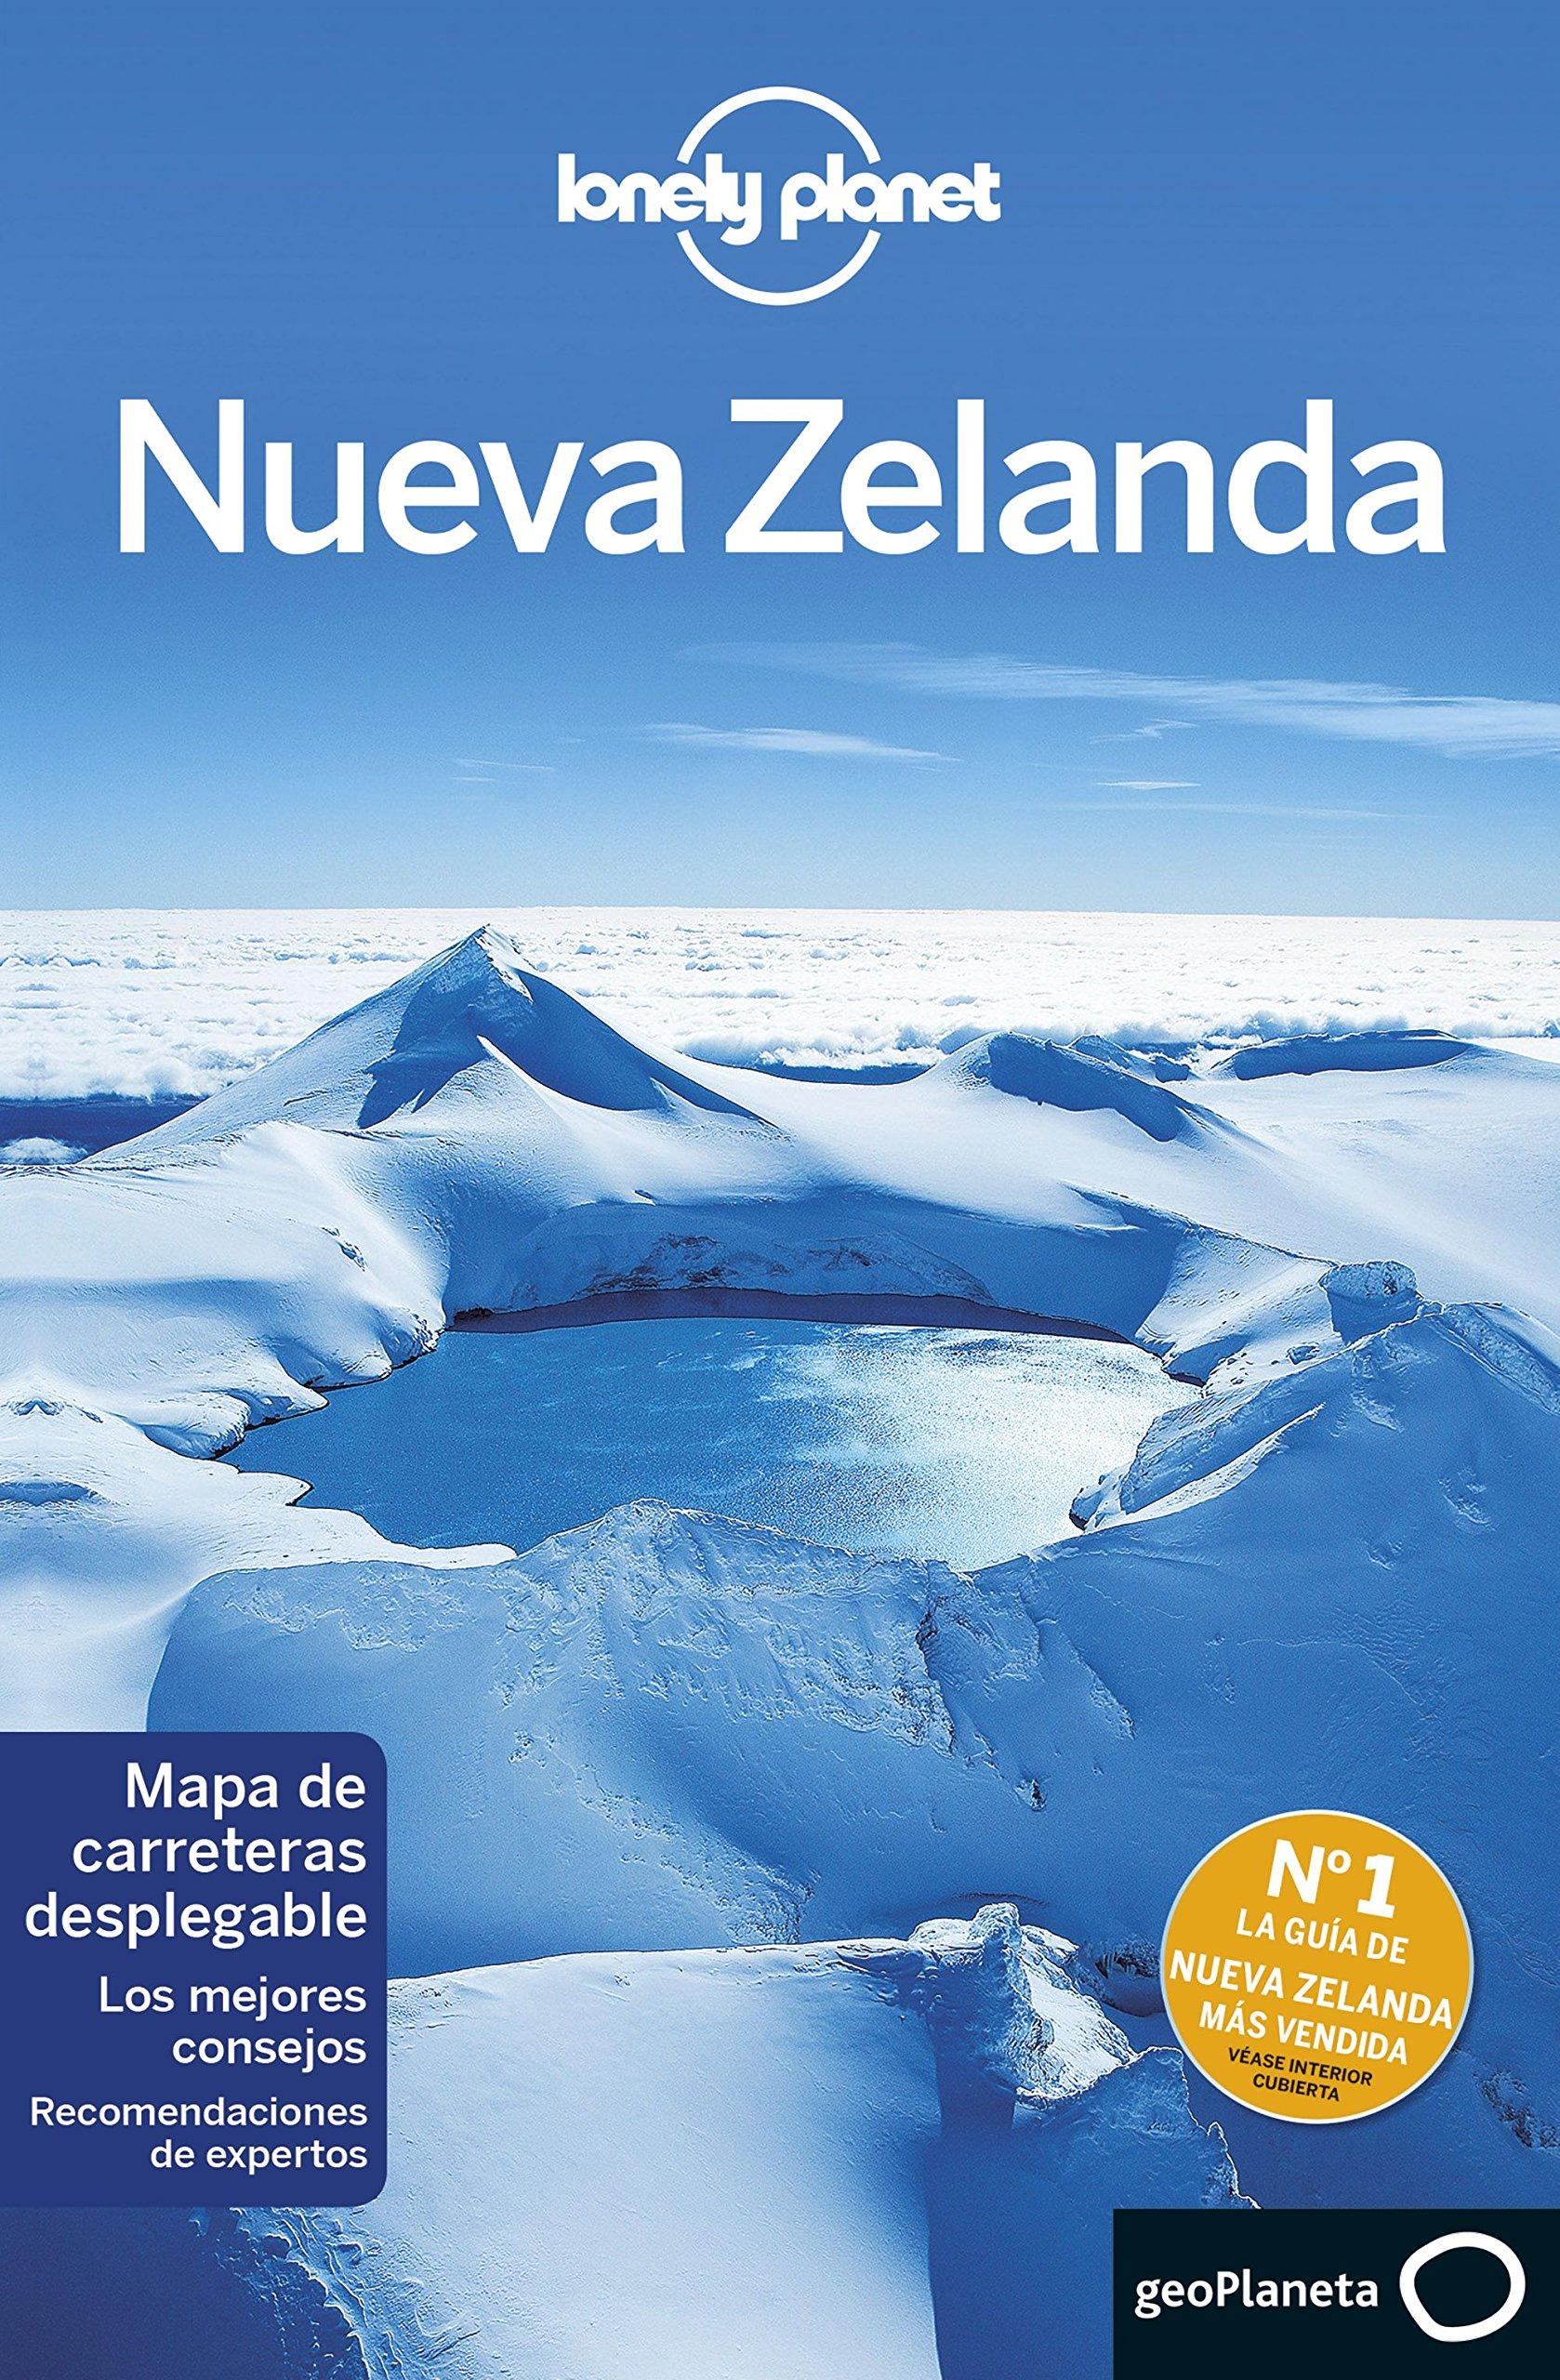 Lonely Planet Nueva Zelanda (Travel Guide) (Spanish Edition): Lonely Planet, Charles Rawlings-Way, Brett Atkinson, Sarah Bennett, Peter Dragicevich, ...